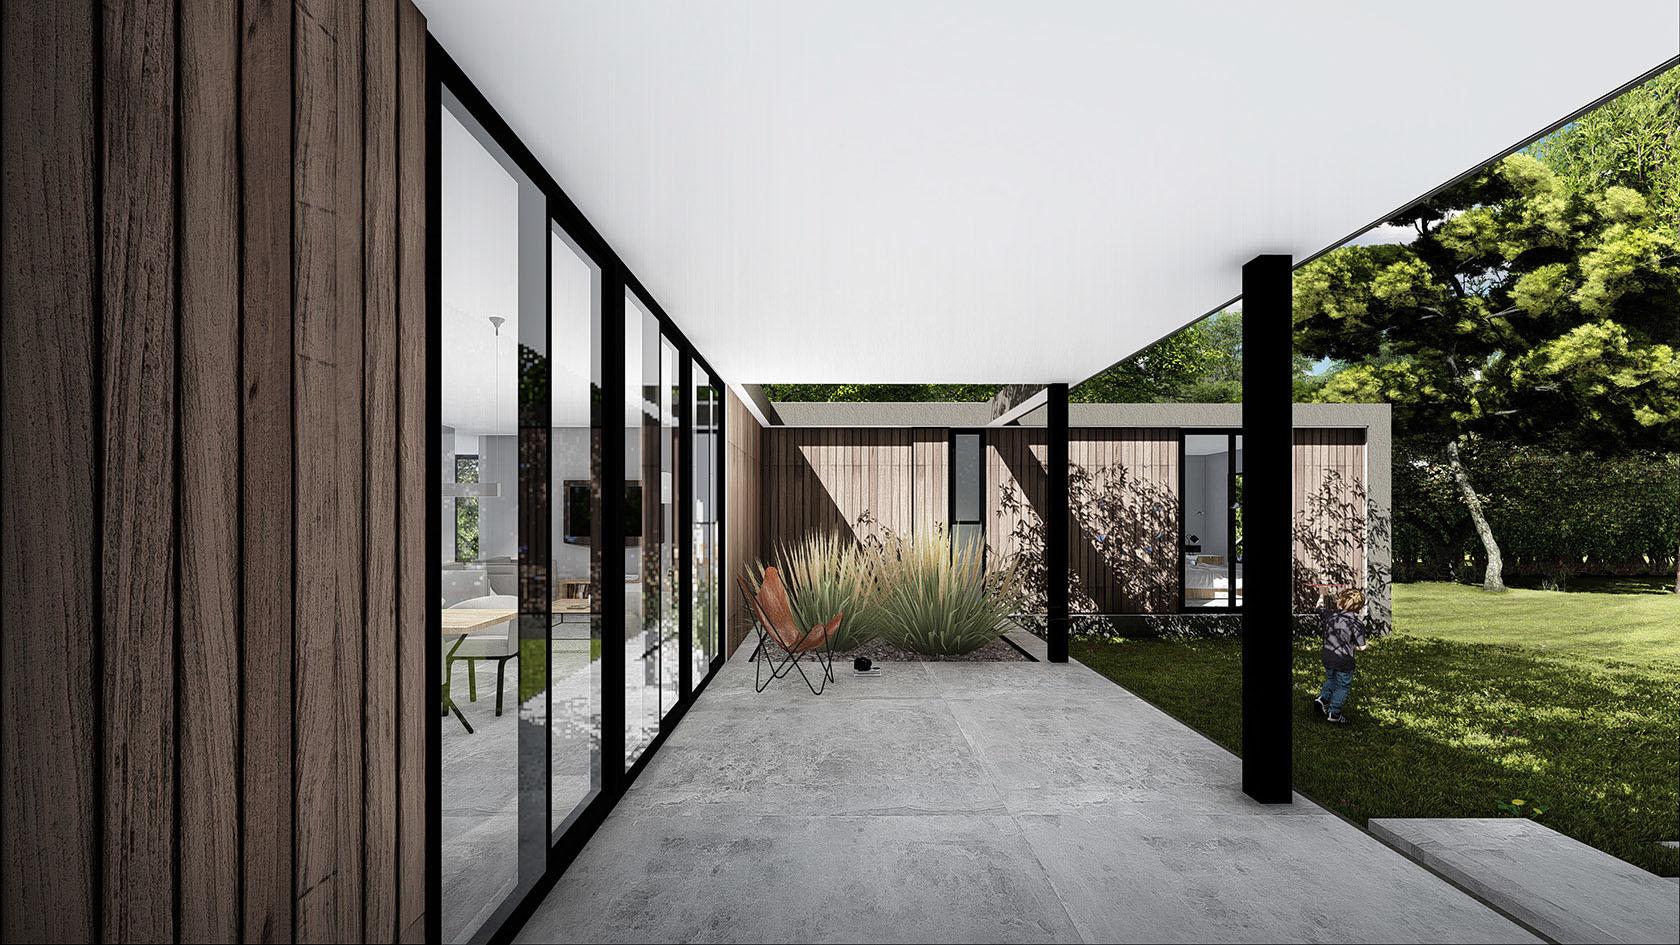 Galerías modernas, casas modernas con grandes jardines